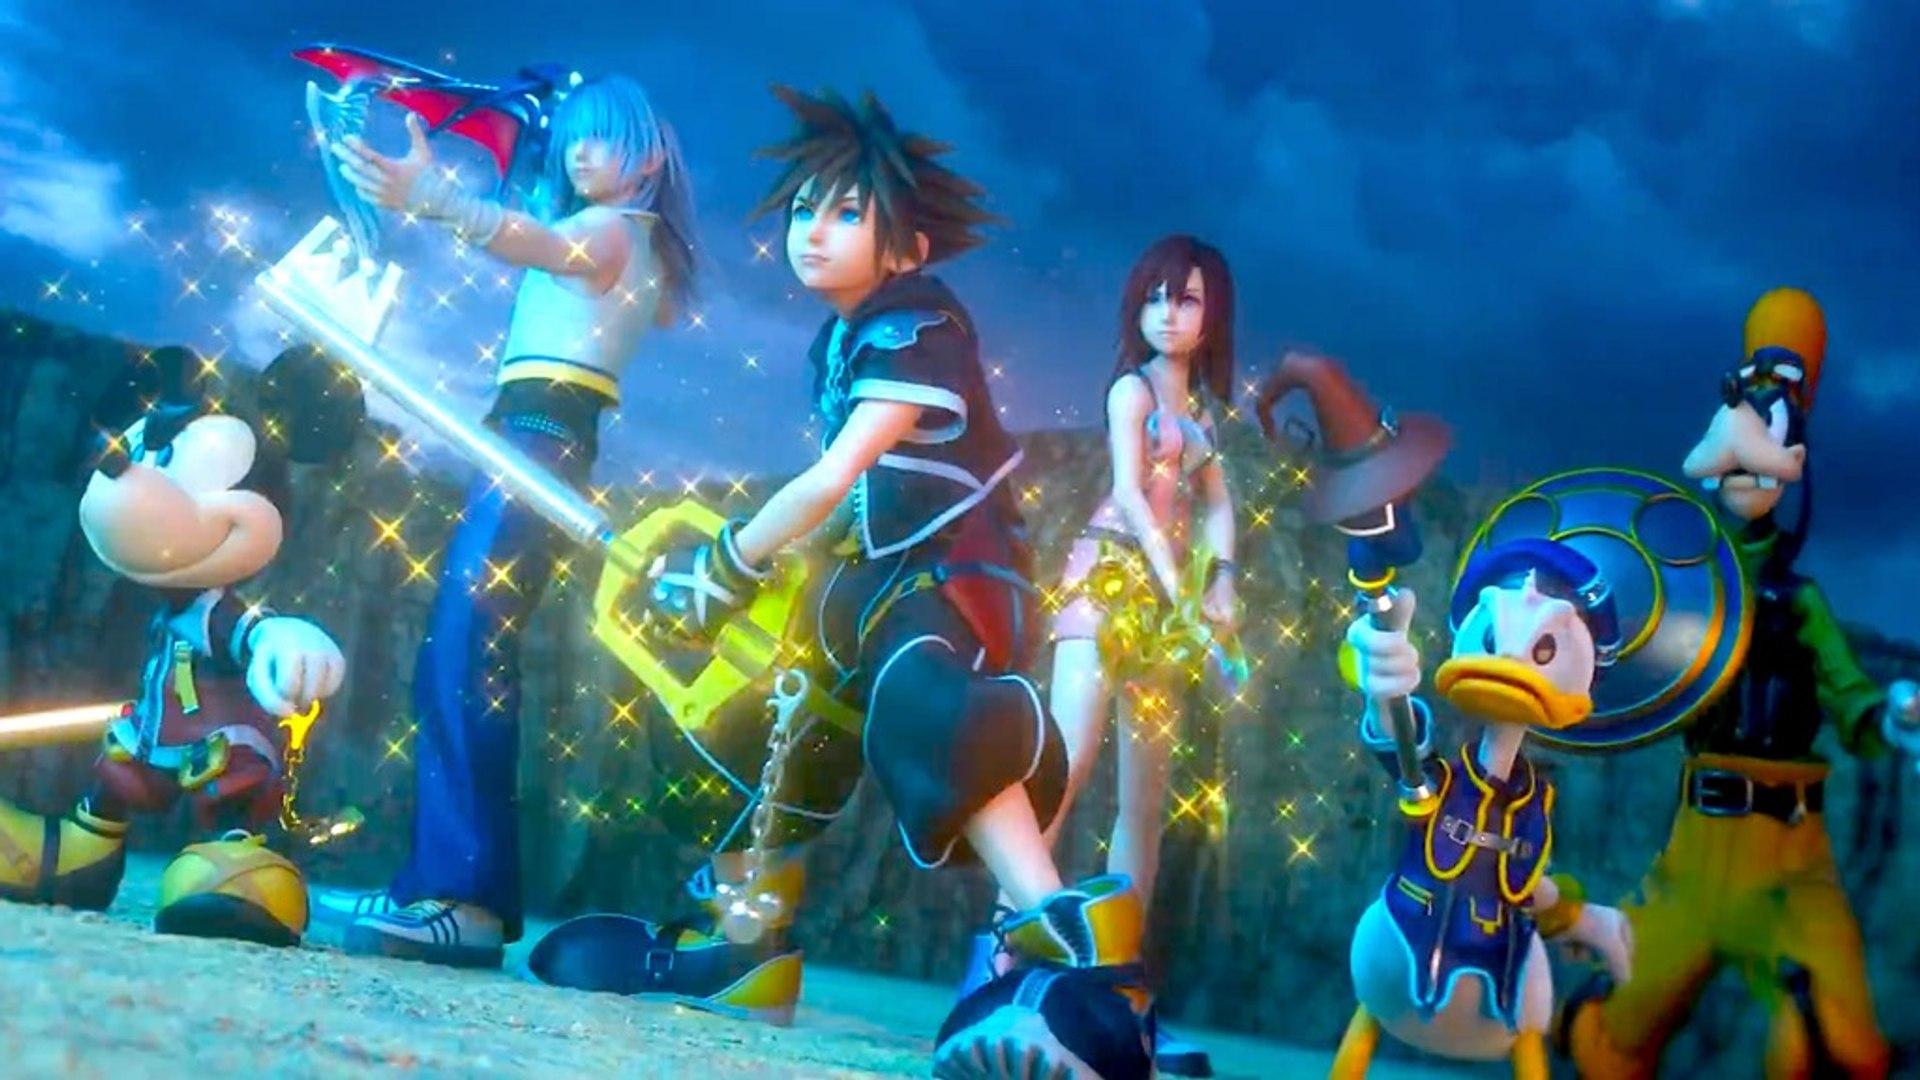 Kingdom Hearts Iii Opening Movie Trailer Video Dailymotion